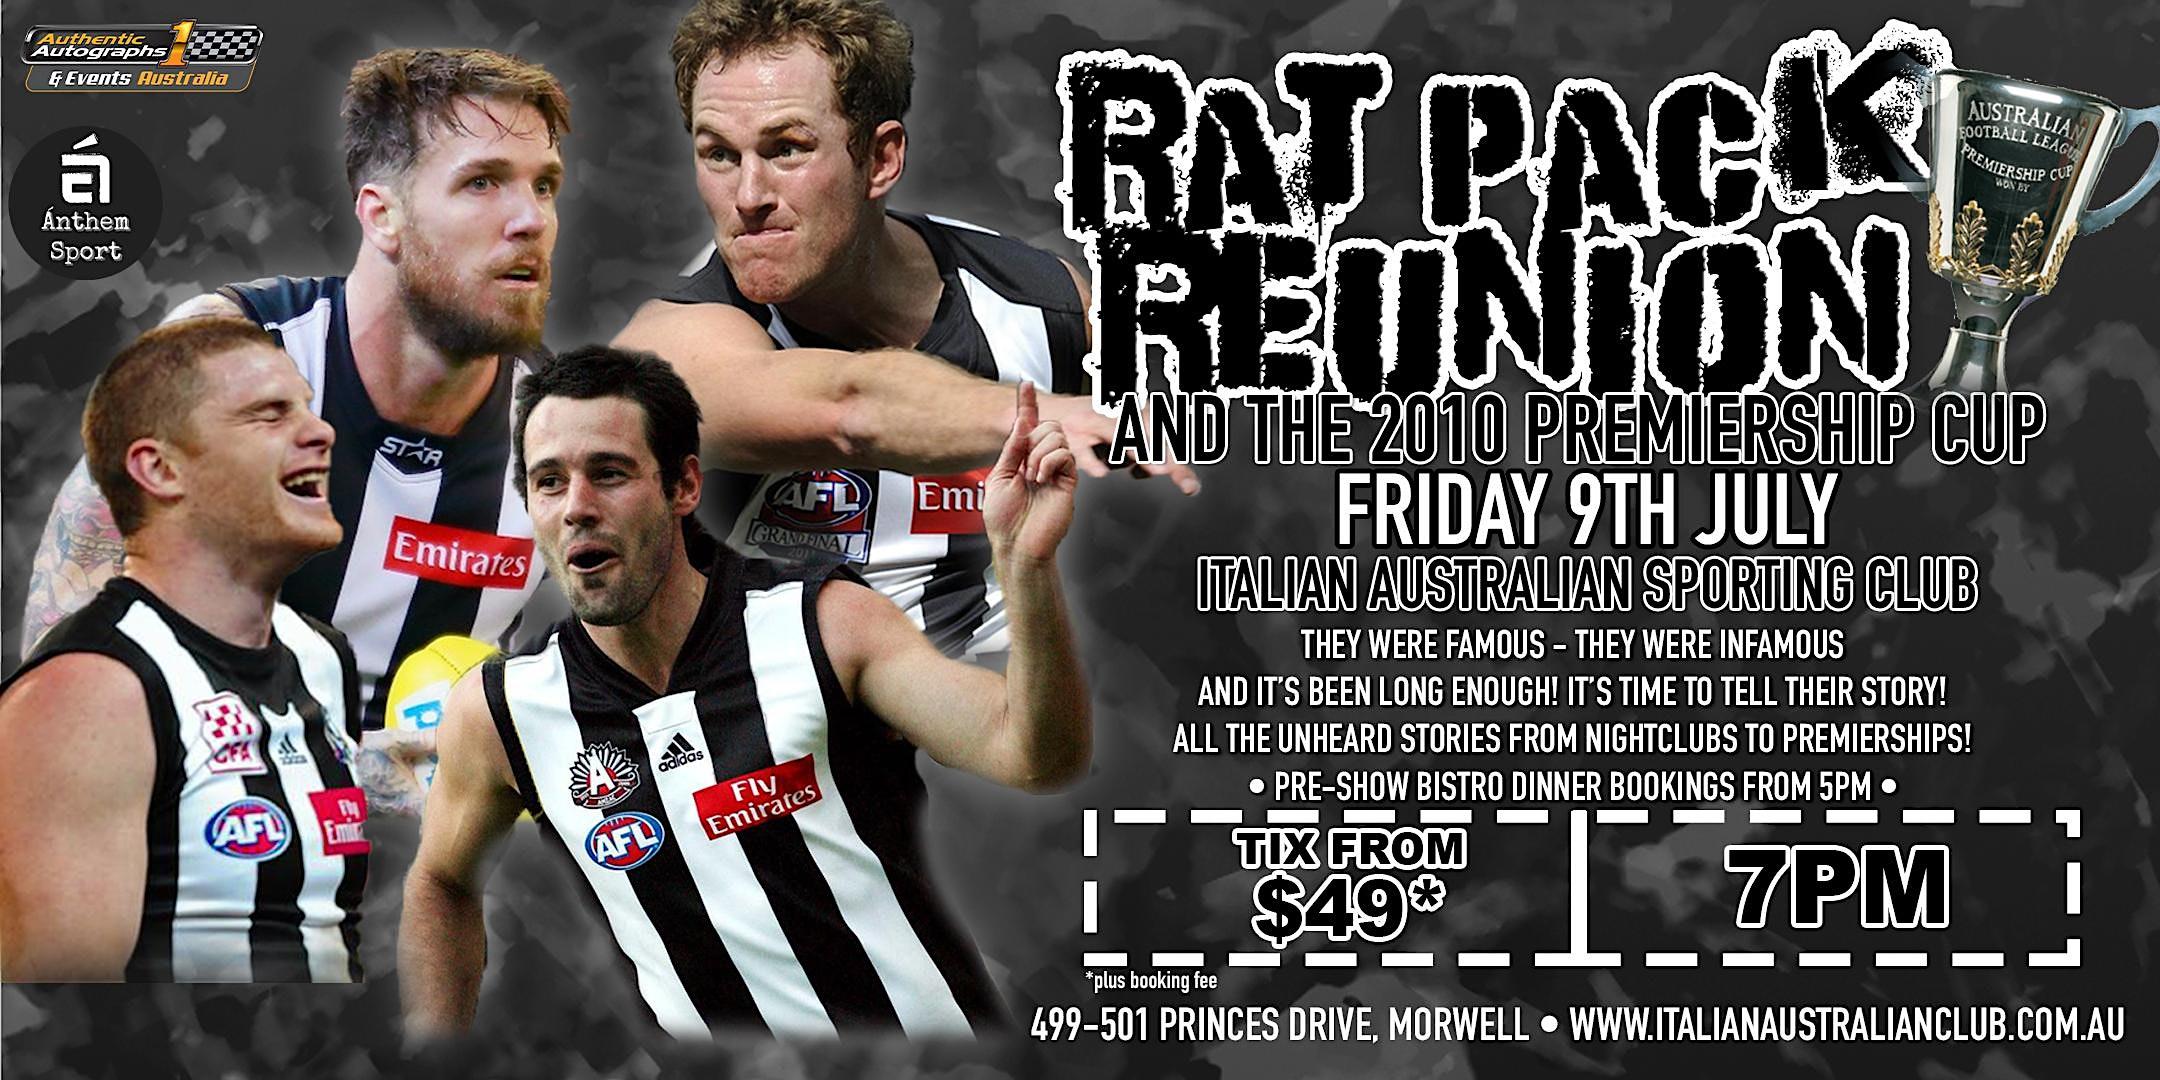 Rat Pack Reunion at Italian Australian Sporting Club!